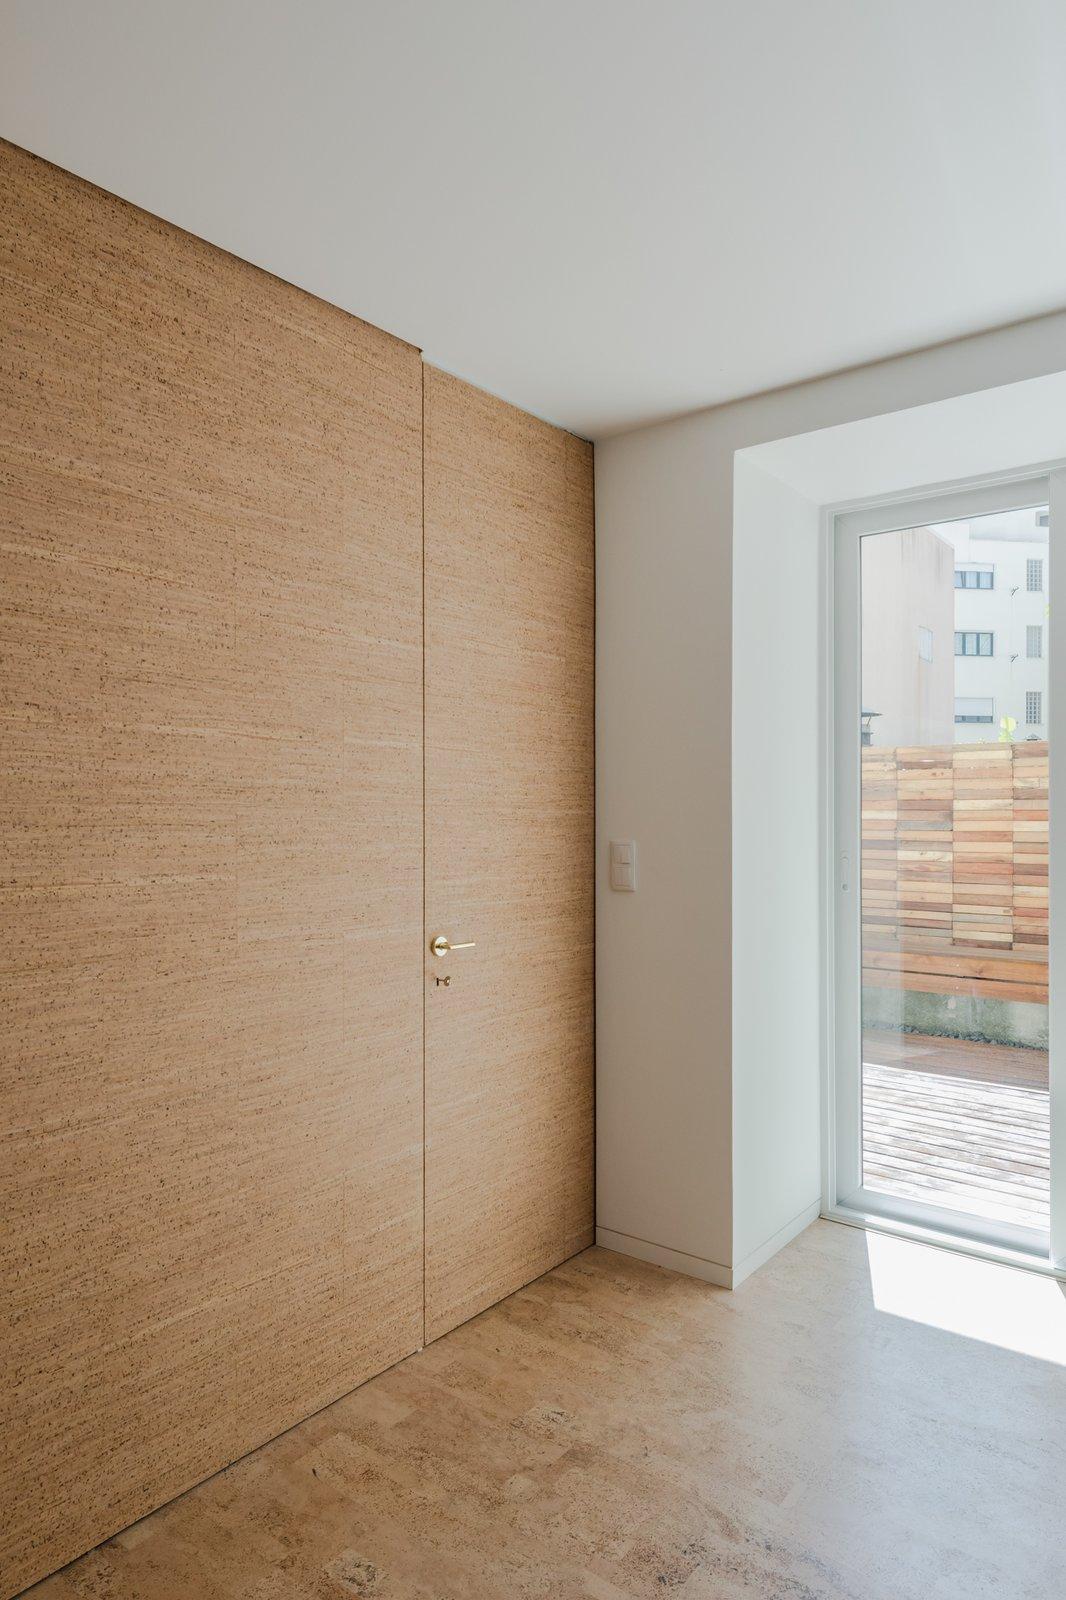 Tagged: Living Room, Cork Floor, and Ceiling Lighting. Rua Maria Loft by KEMA studio